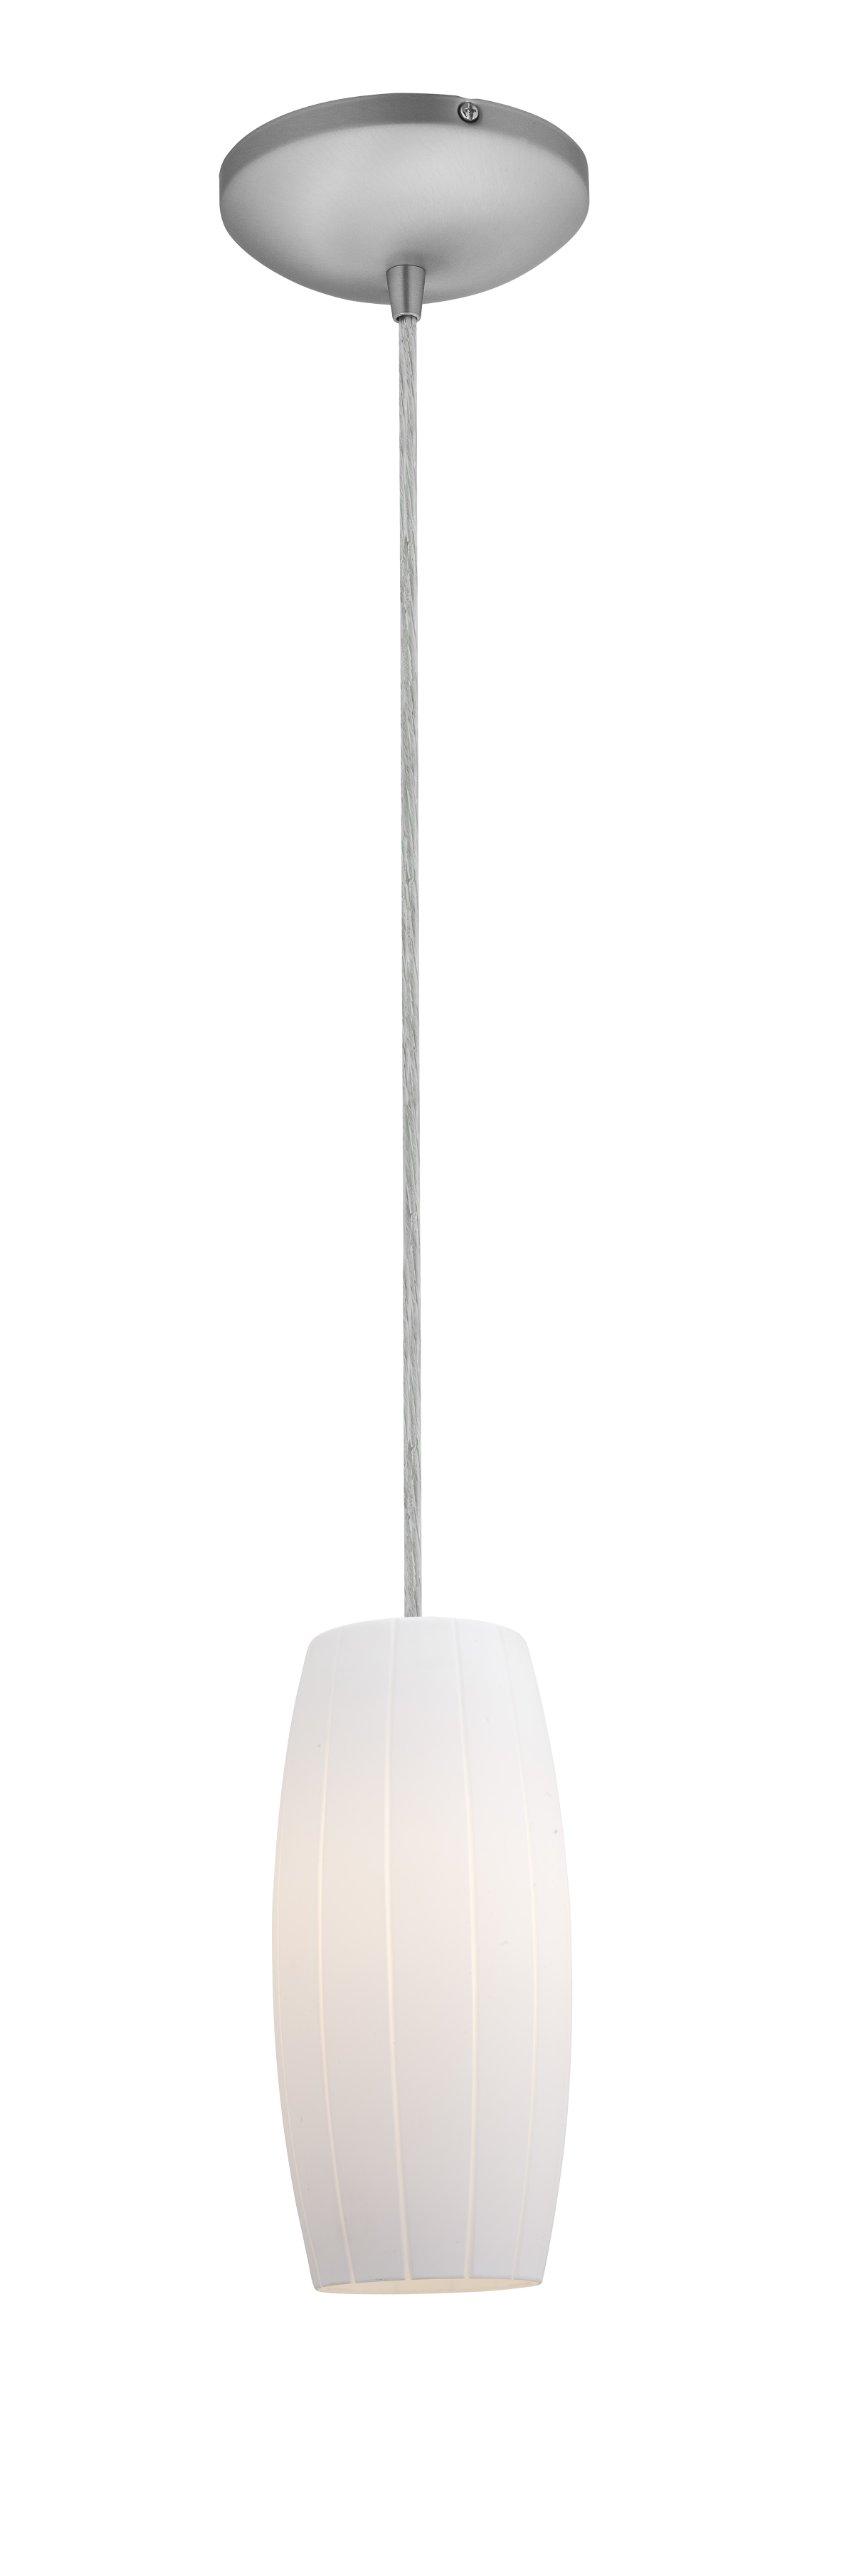 Cognac Glass Pendant - 1-Light Pendant - Cord - Brushed Steel Finish - White Glass Shade